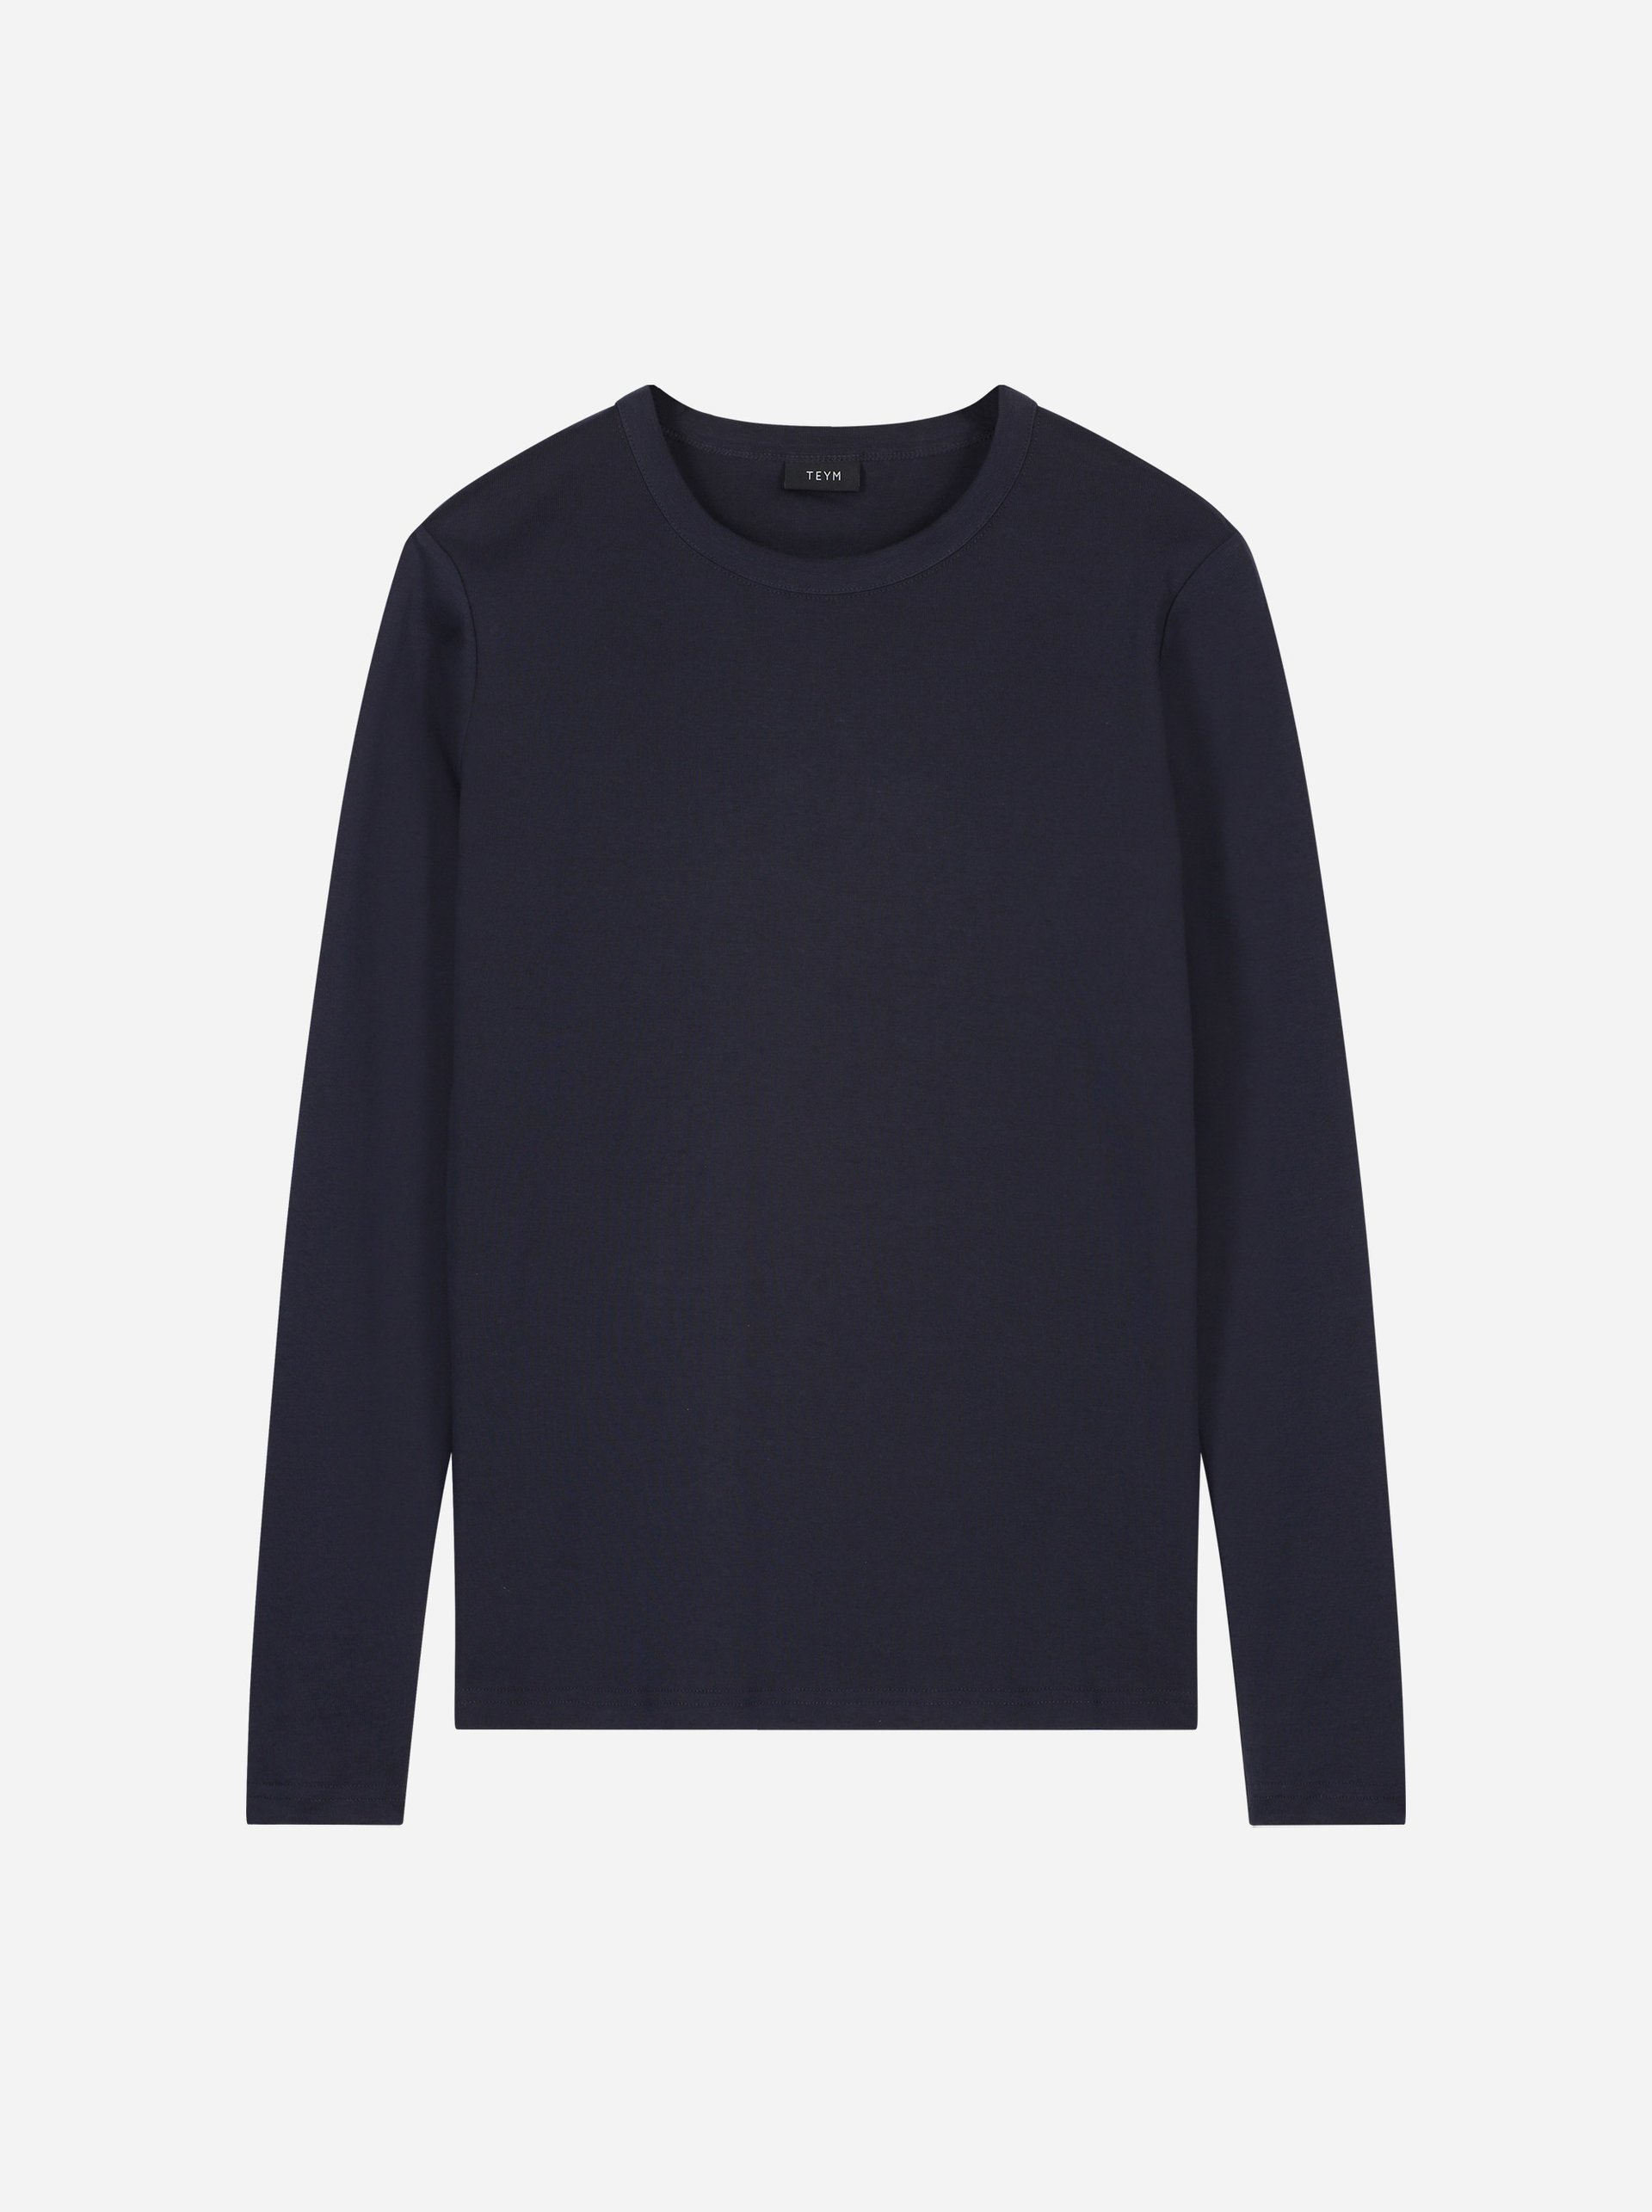 Teym - The-T-Shirt - Longsleeve - Women - Blue - 4